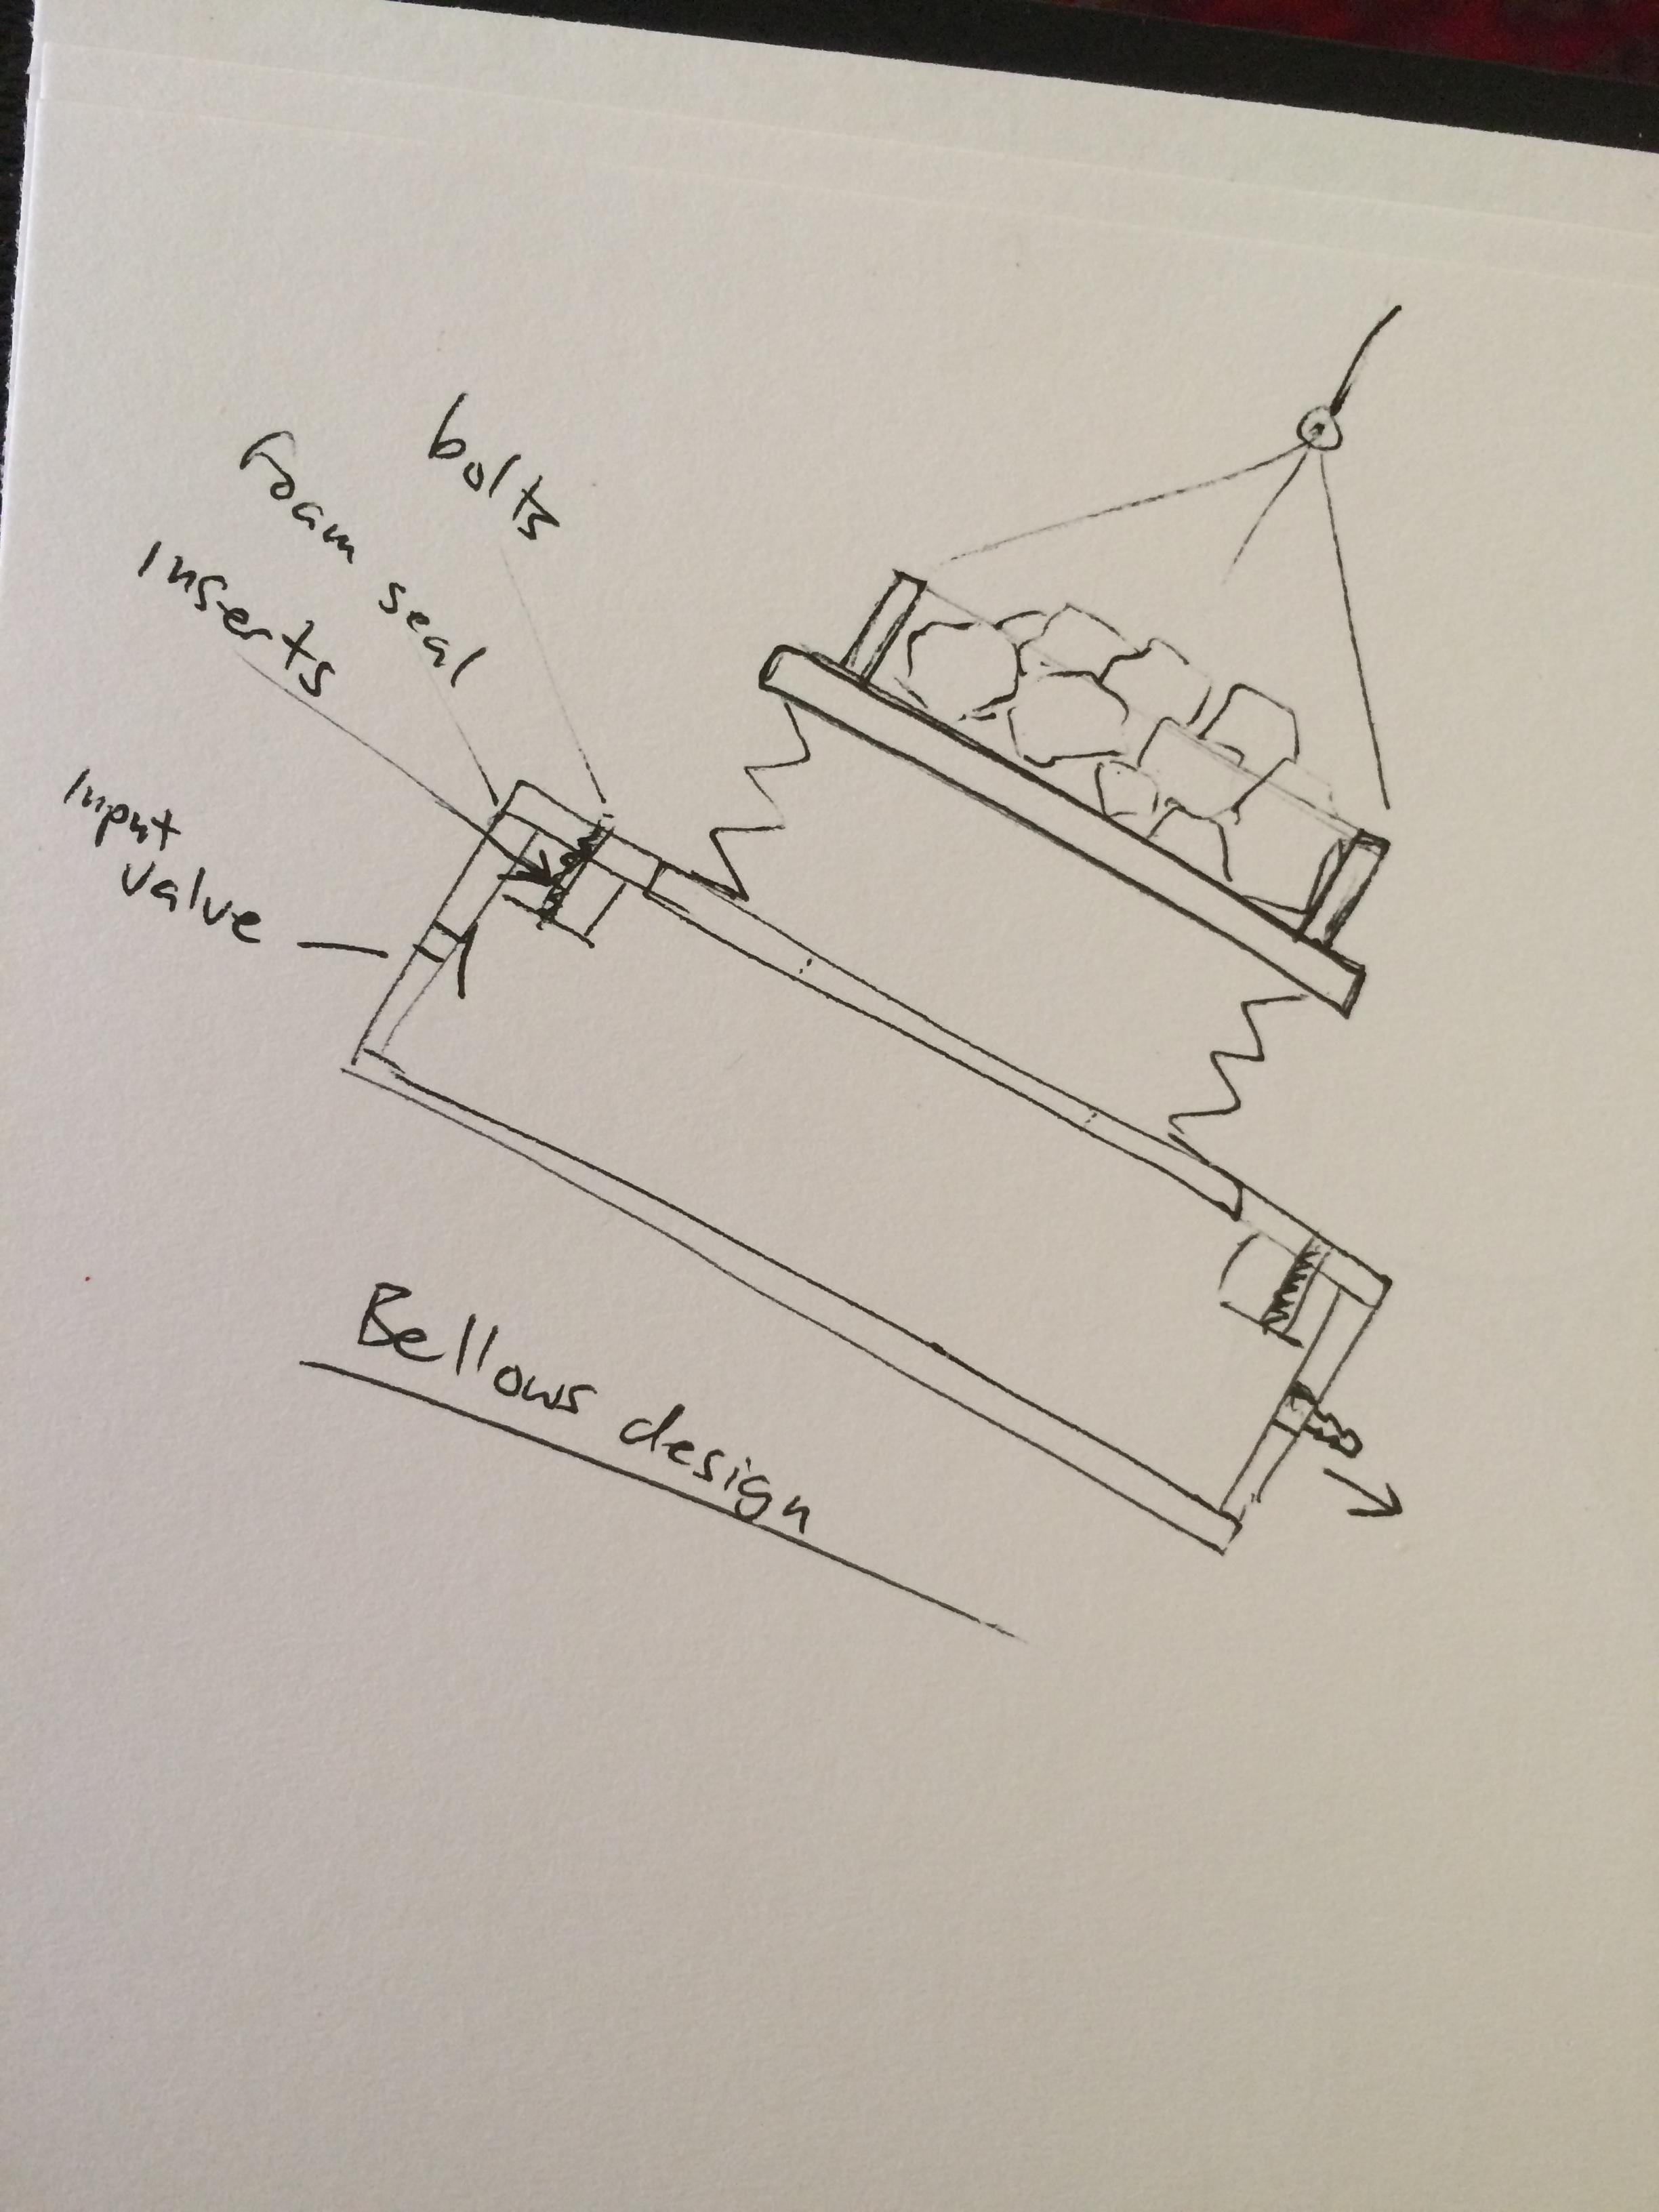 Bellows and air box sketch